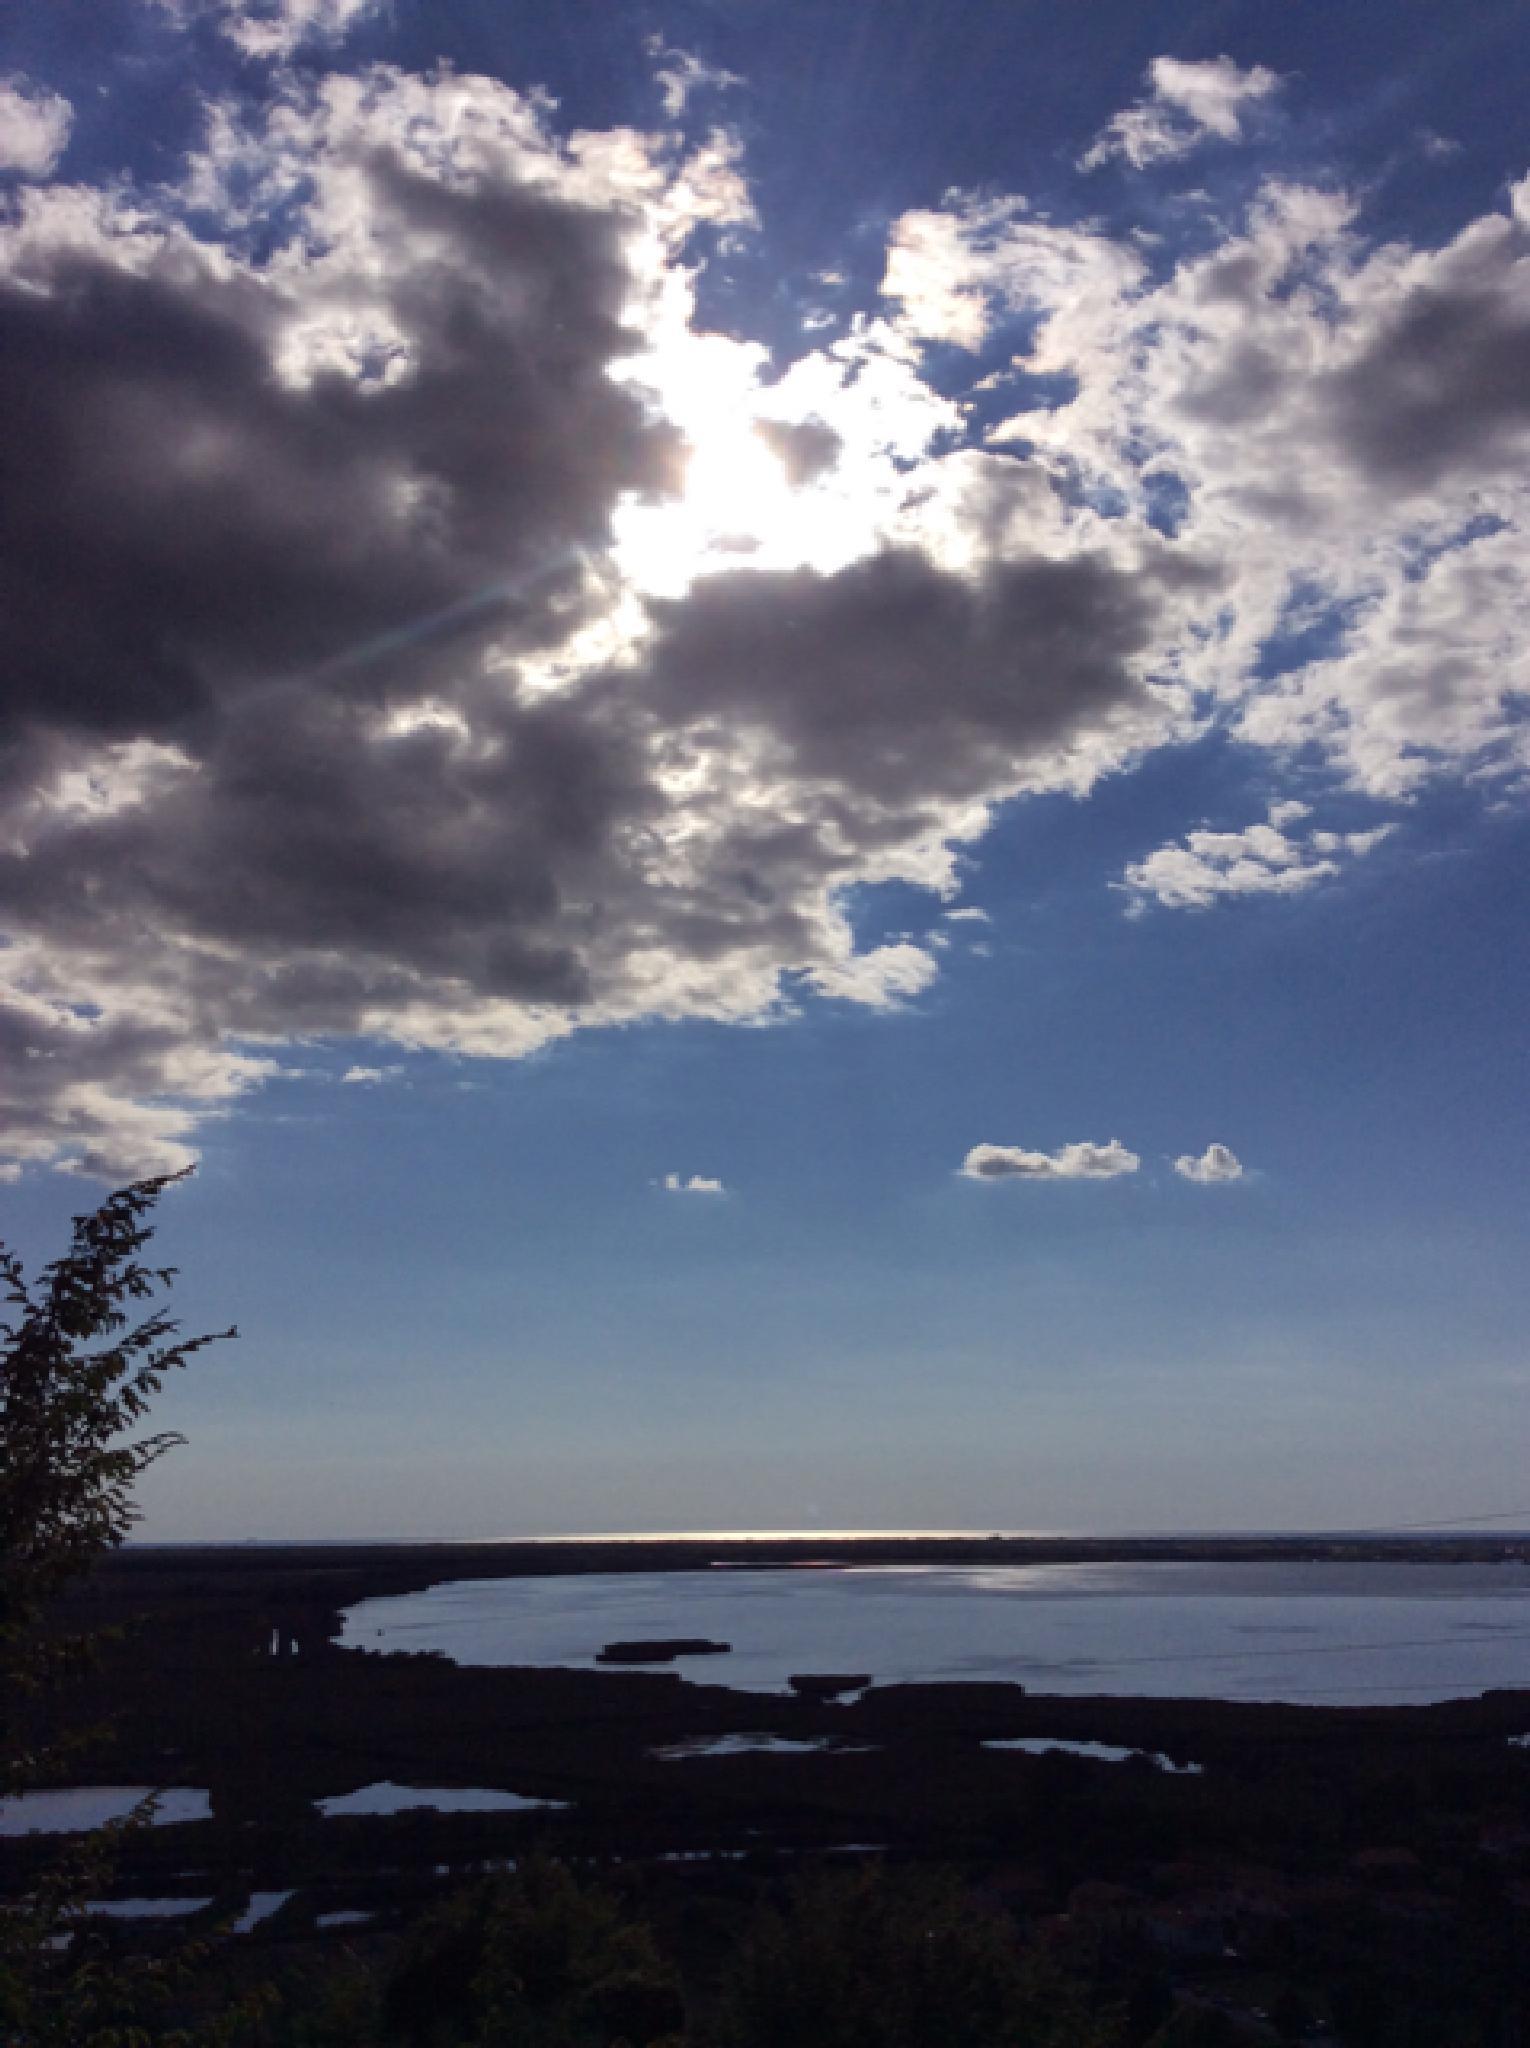 lake  by elena.lena.735